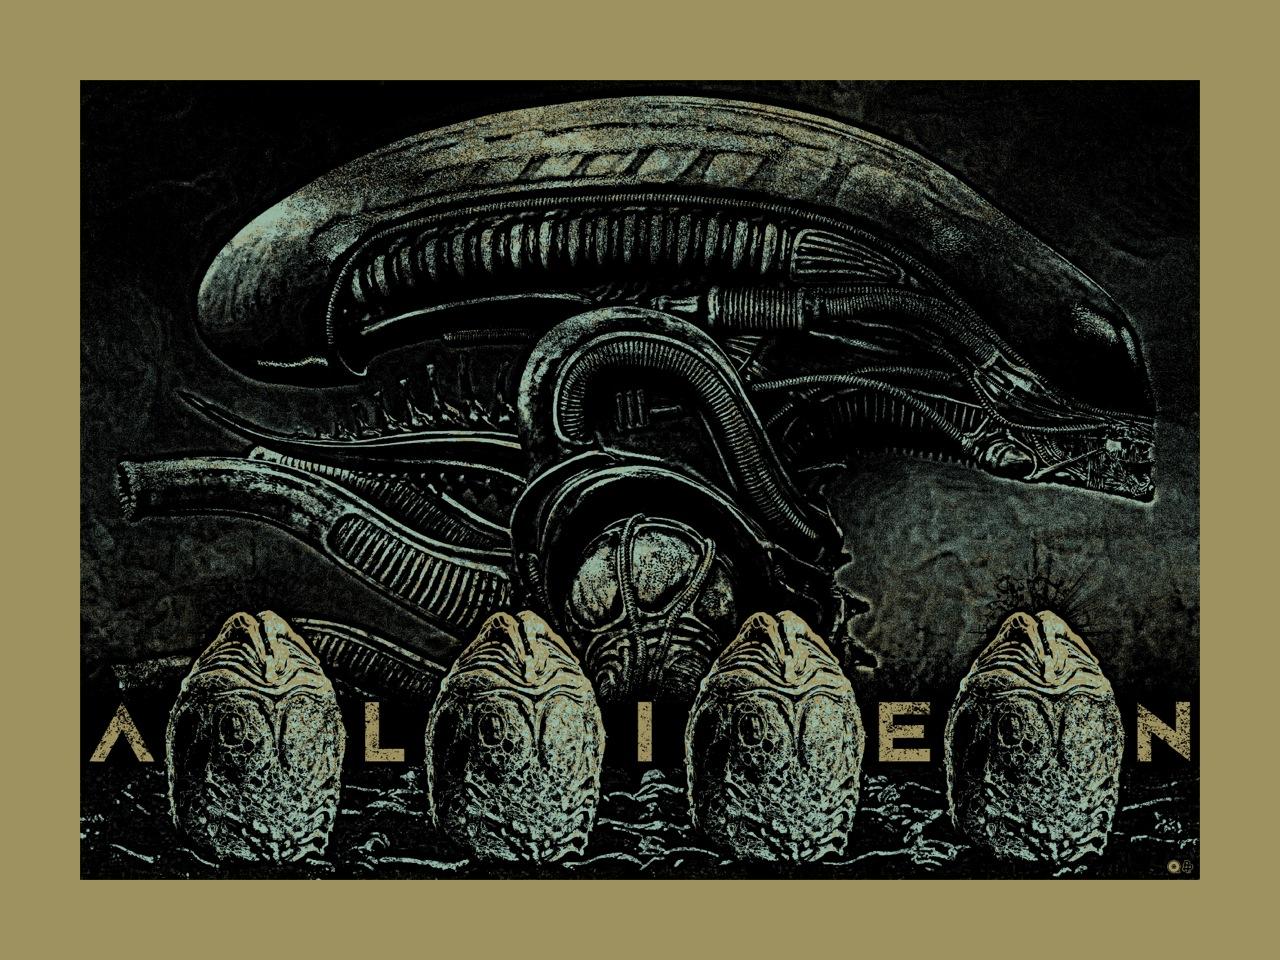 Alien-35th-anniversary-by-Chris-Garofalo-1